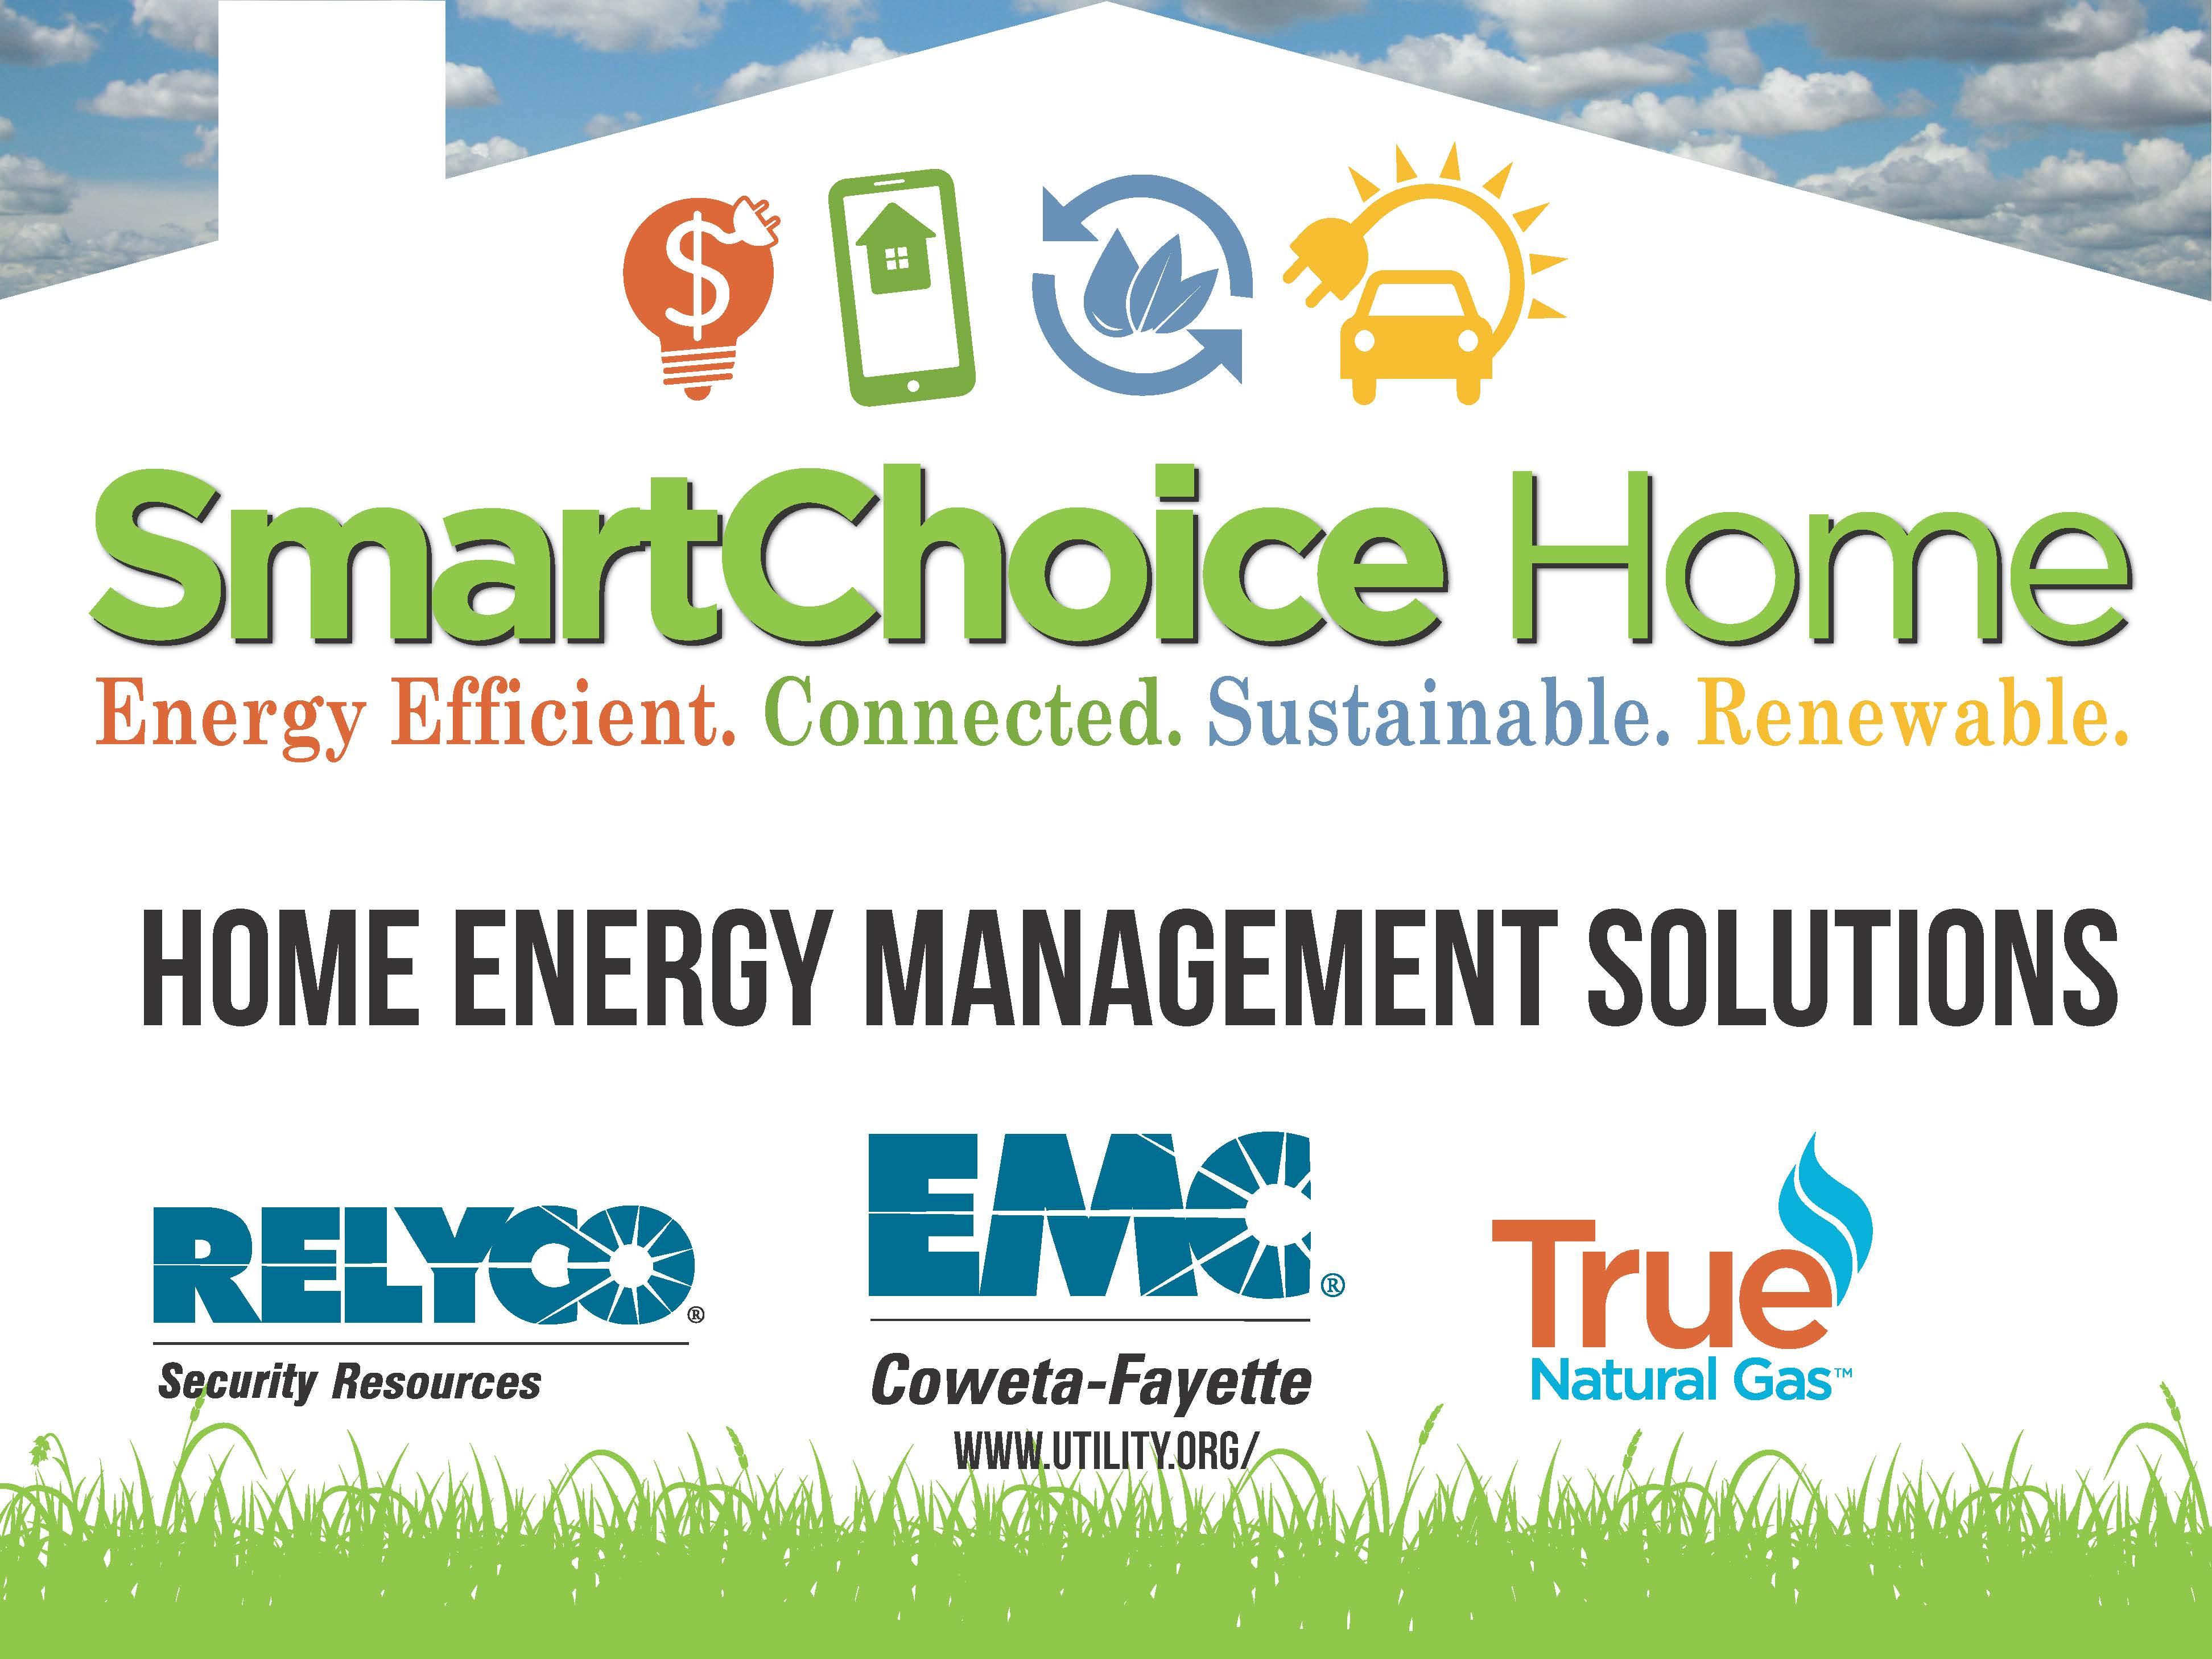 Smart Choice Home Emc Coweta Fayette